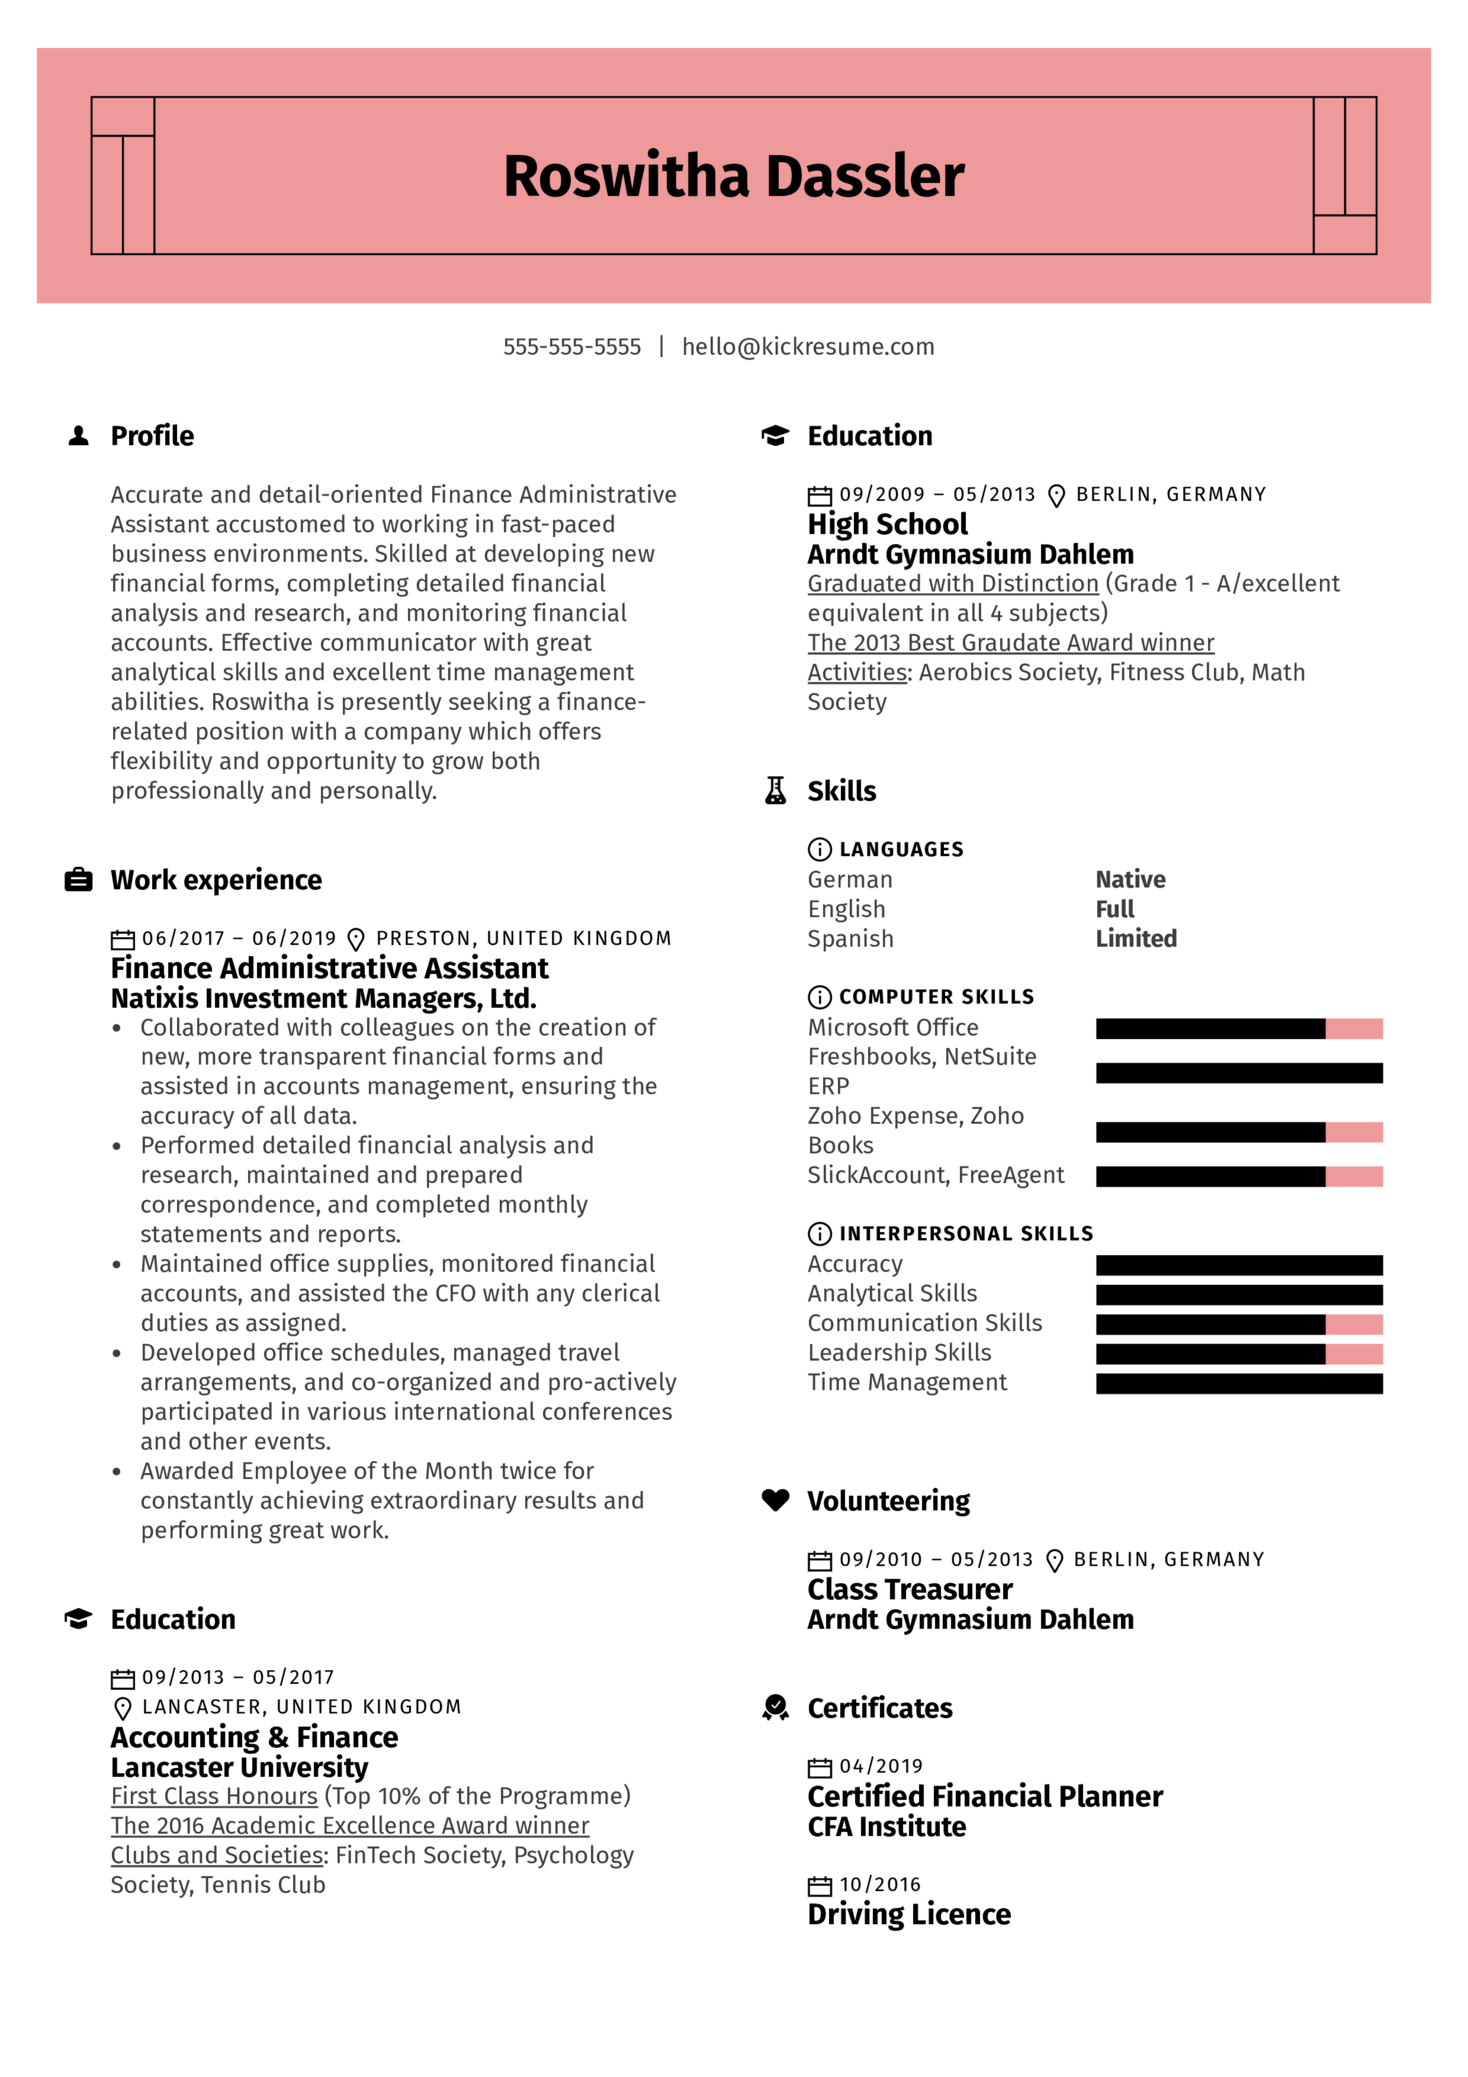 Finance Administrative Assistant Resume Sample (Part 1)